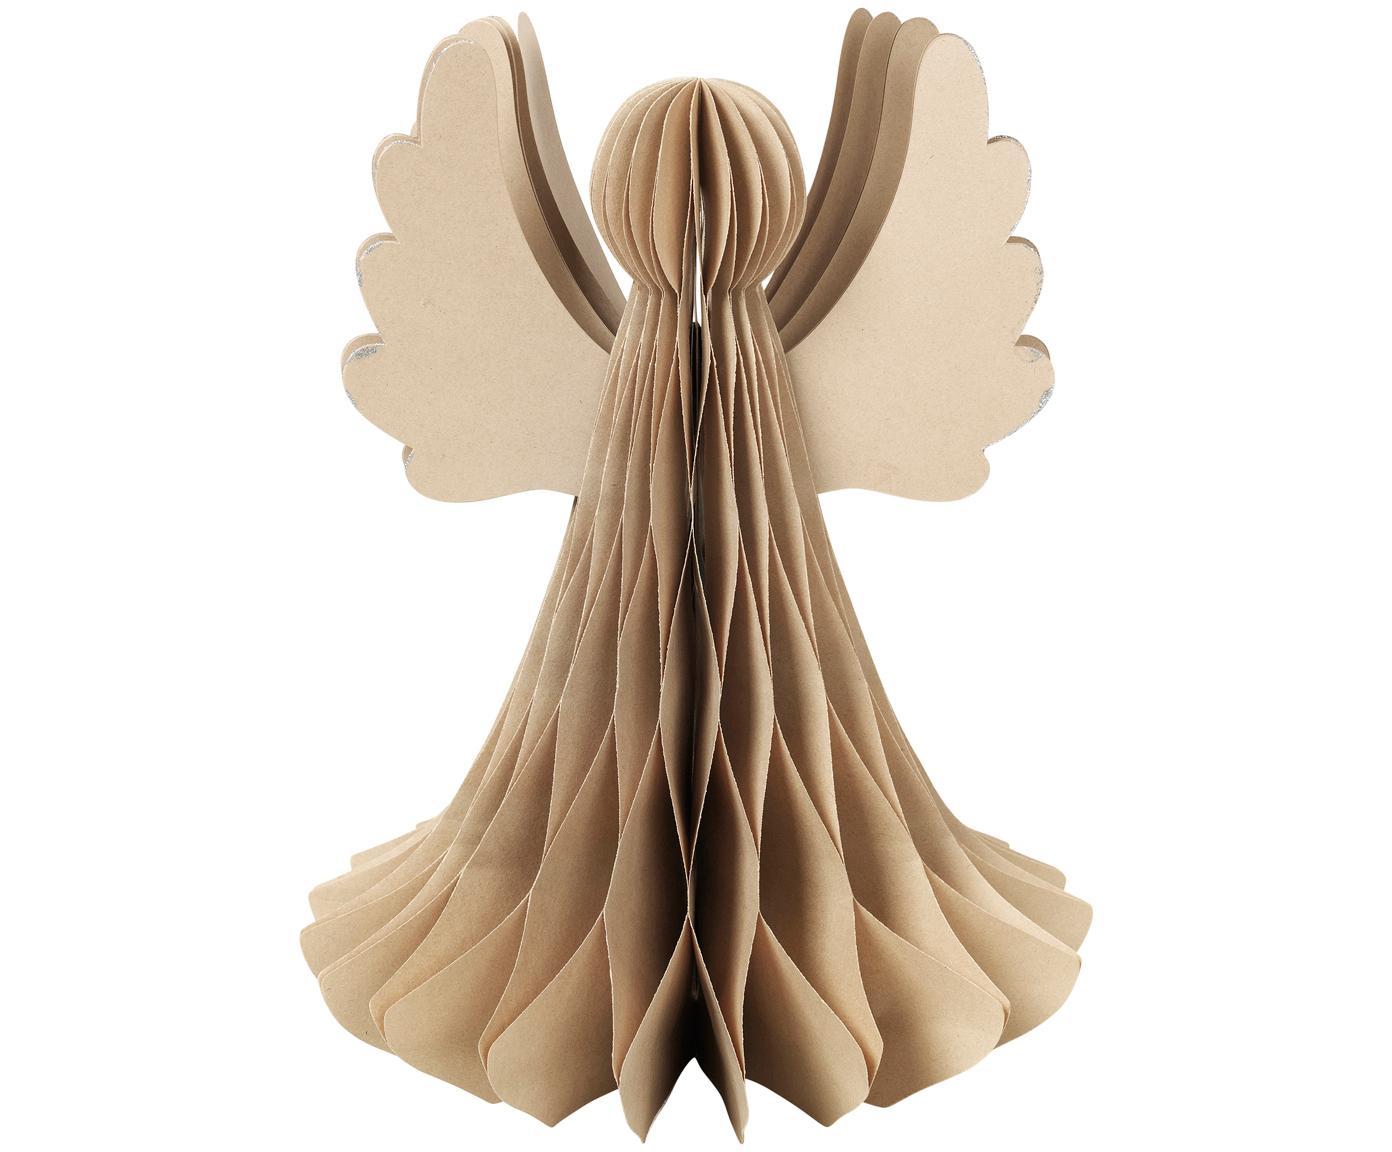 Decoratief object Angel, Papier, Beige, Ø 21 x H 27 cm